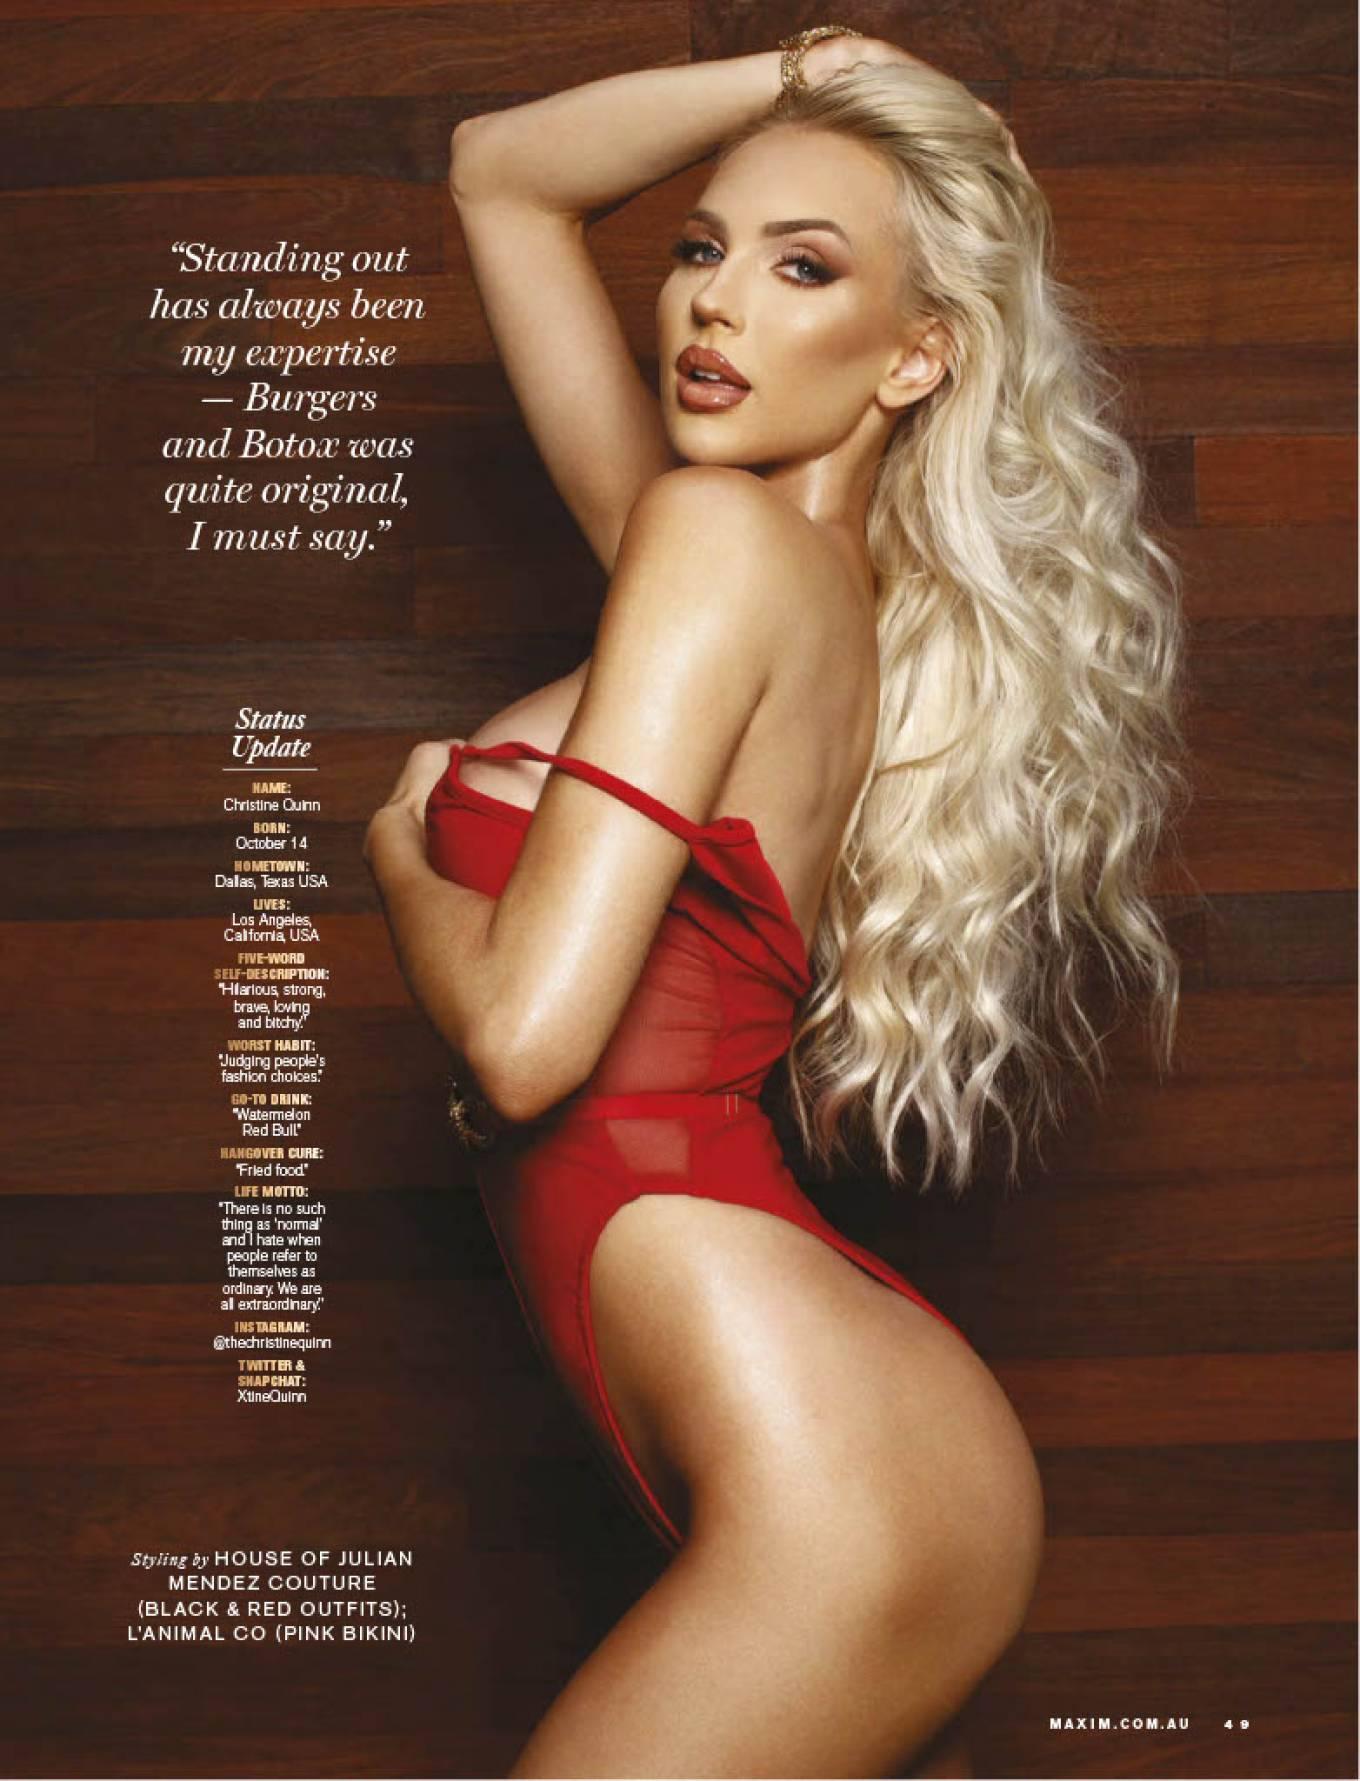 Scarlett Johansson Maxim photo 23